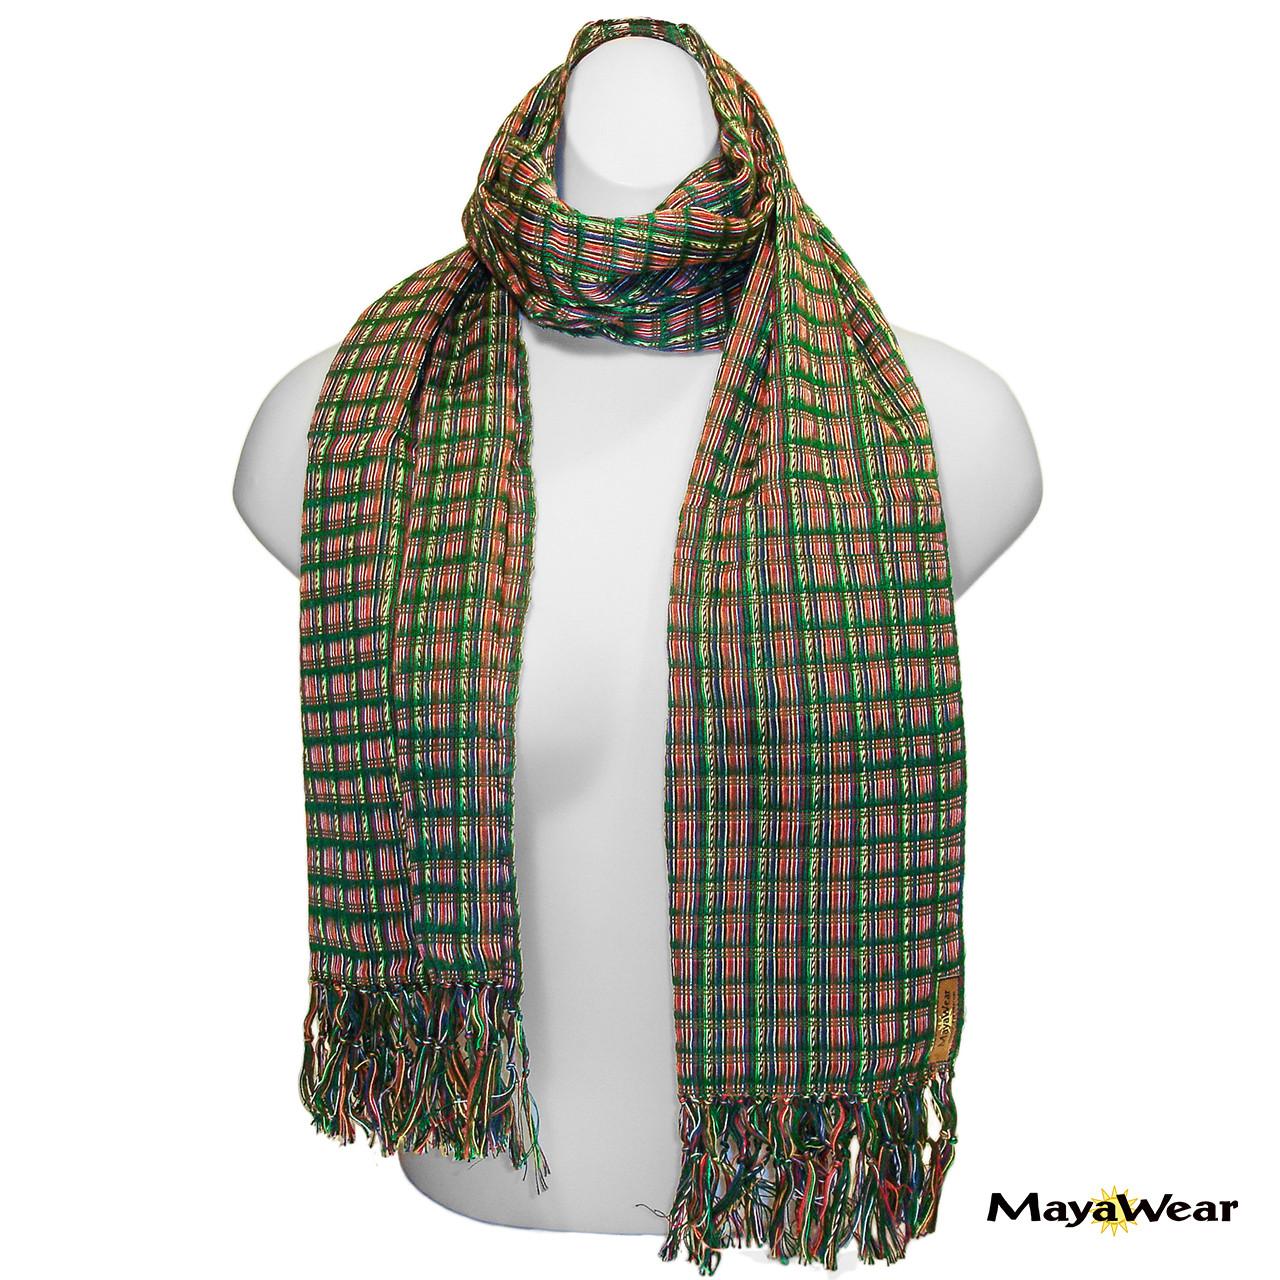 "SSRF134 - ""Springtime"" Scarf w/Fringe. 100% Cotton. Made in Guatemala. https://www.mayawear.com"